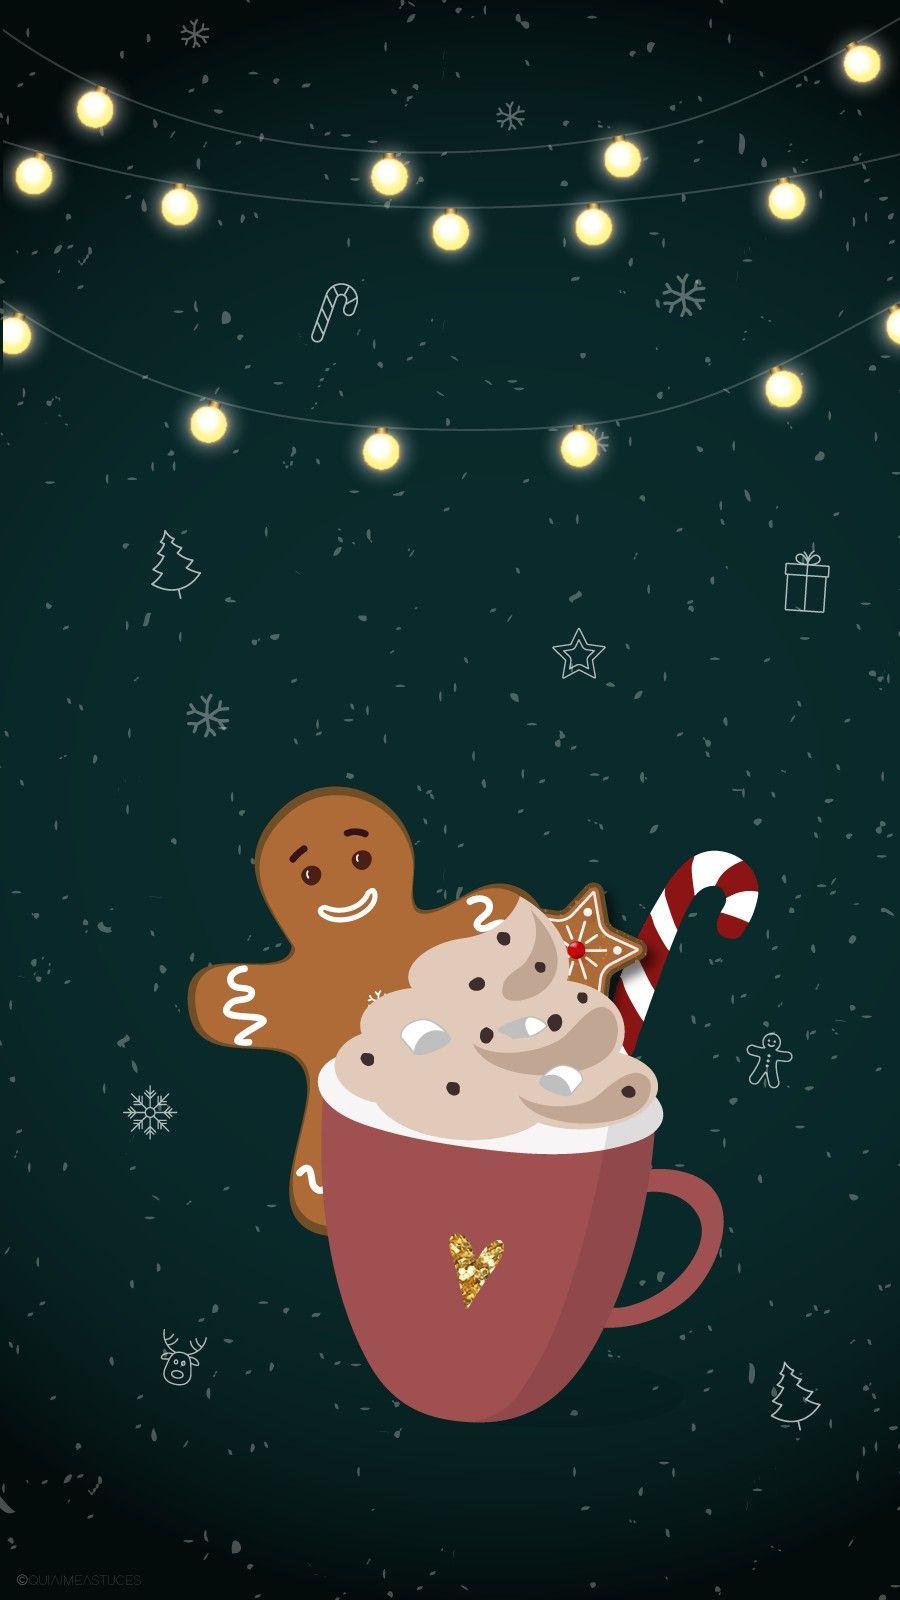 Pin By Amanda Hiers On Fonds D Ecran Wallpaper Iphone Christmas Cute Christmas Wallpaper Fall Wallpaper